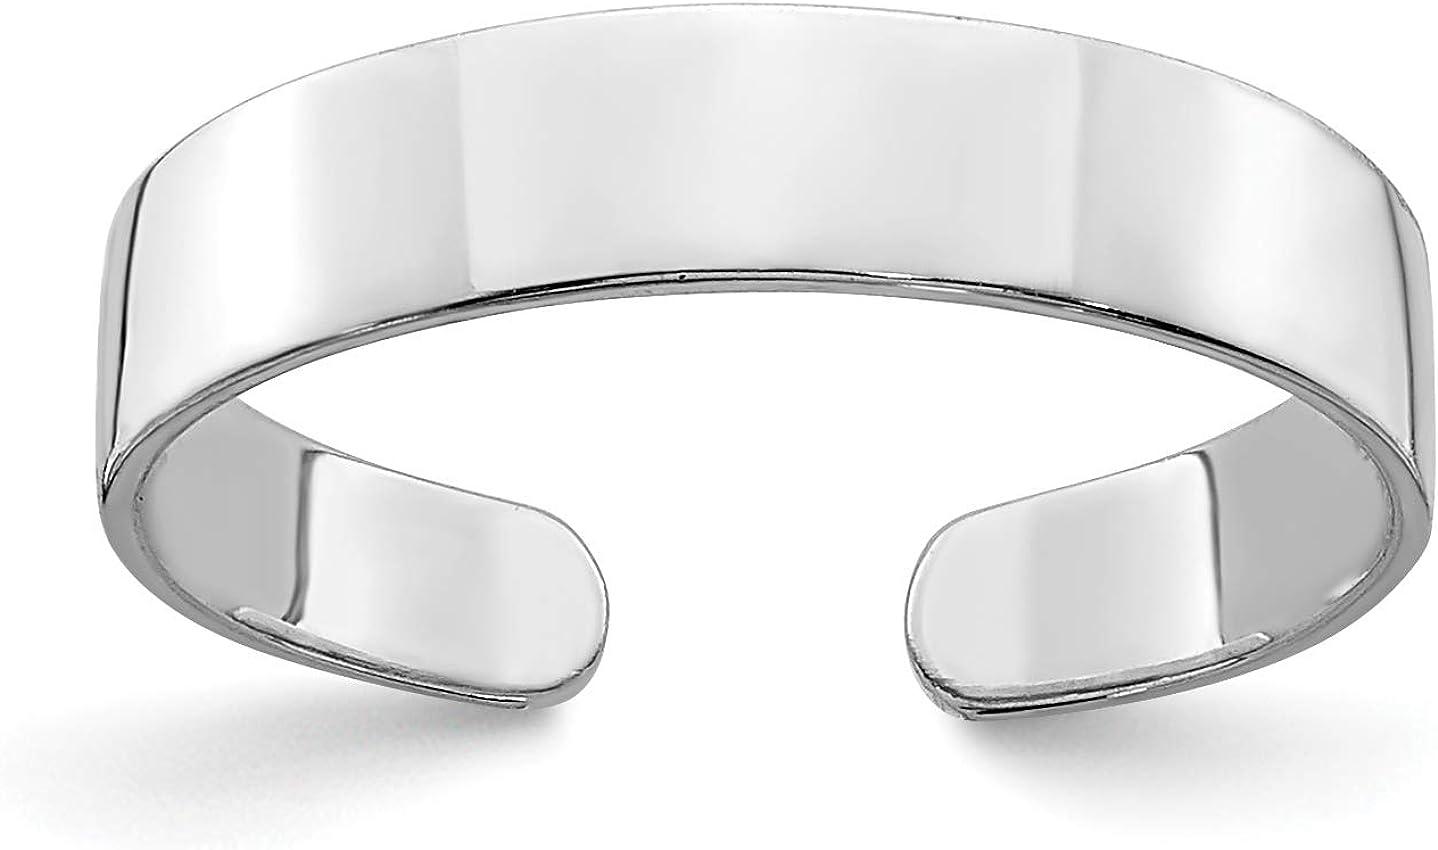 14k White Gold Traditional Plain Toe Ring